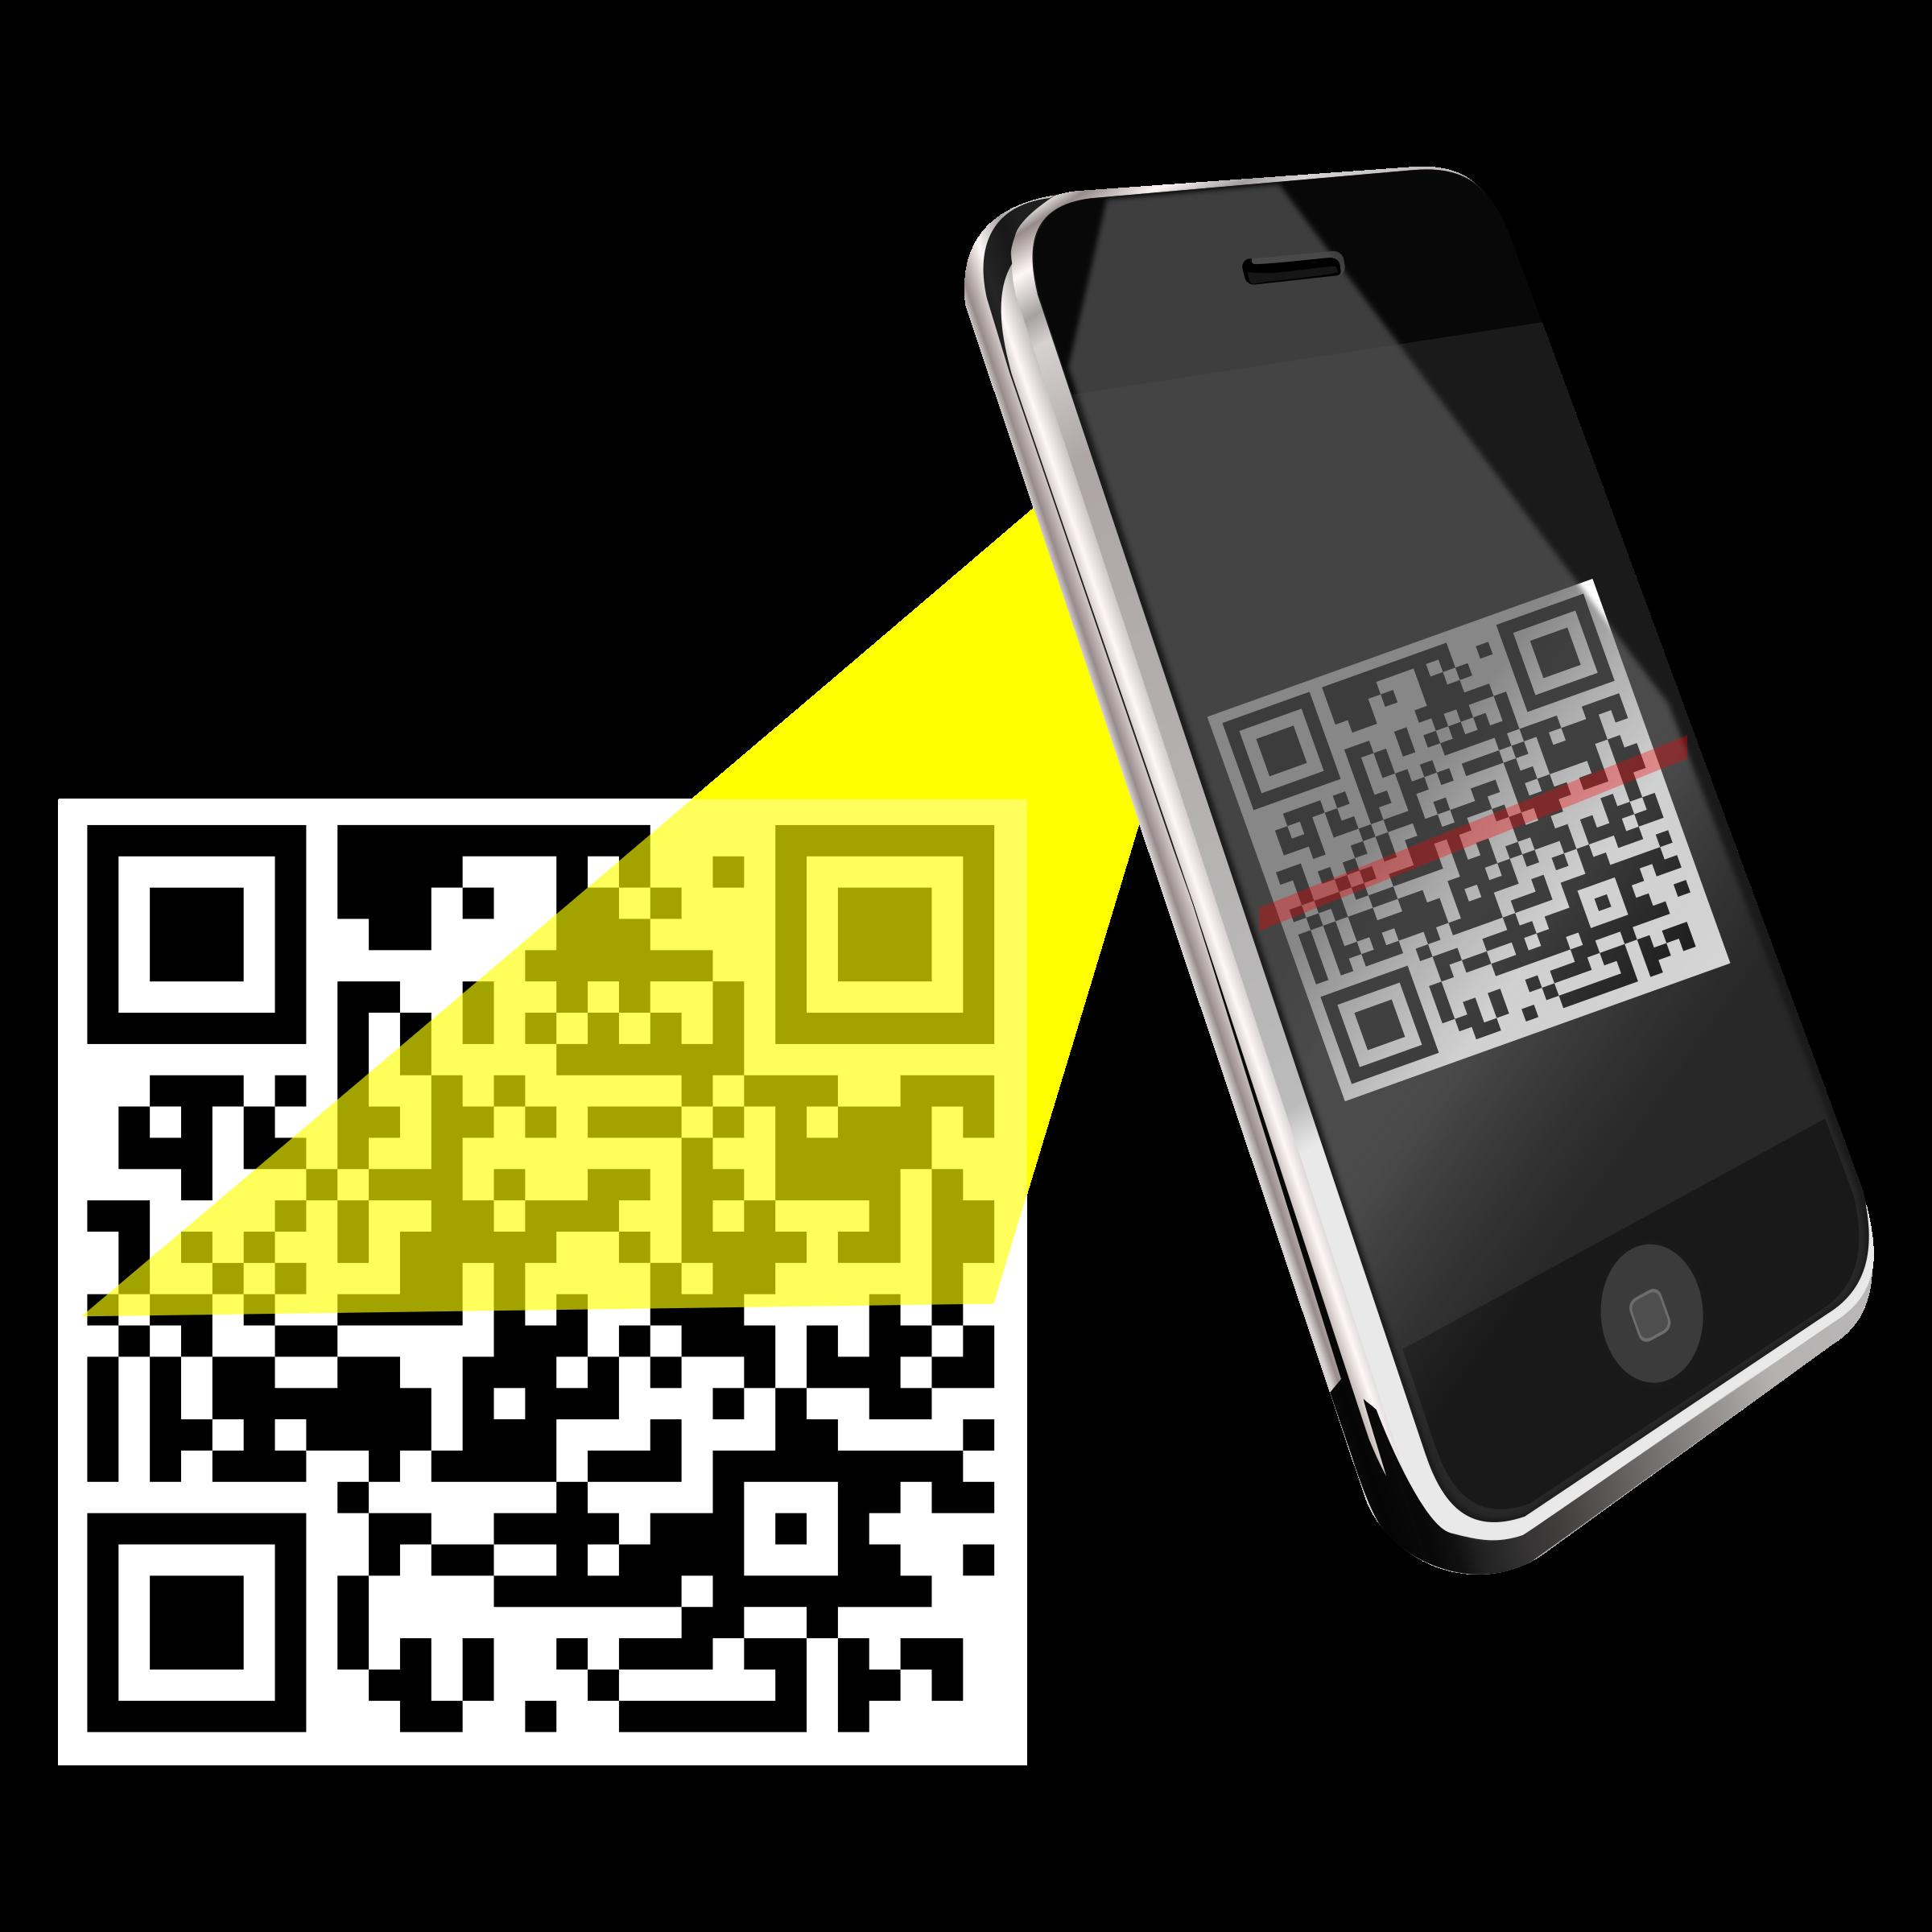 Code clipart qr code Clipart Code QR code Clipart